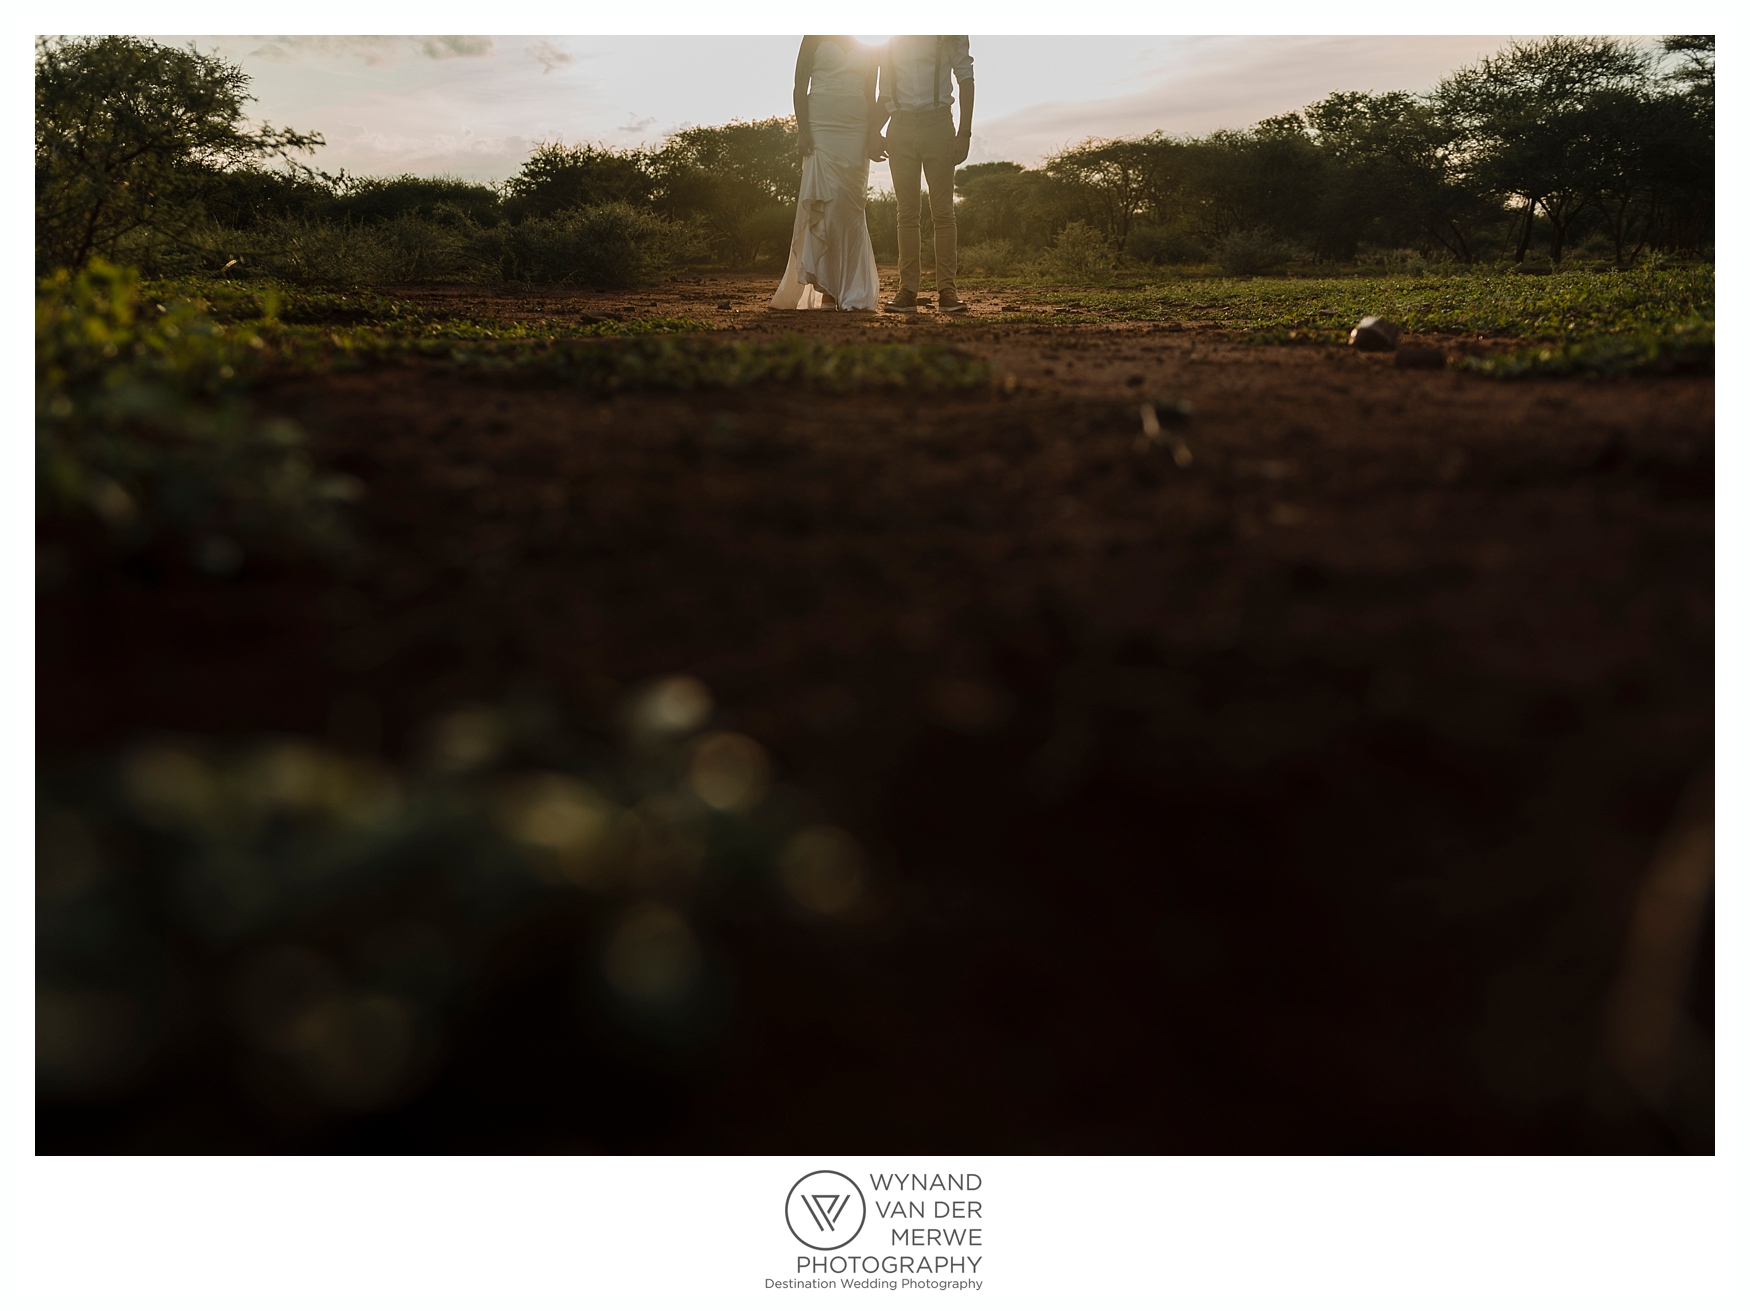 WynandvanderMerwe_weddingphotography_bushveldwedding_northam_bushveld_limpopowedding_limpopo_southafrica-247.jpg